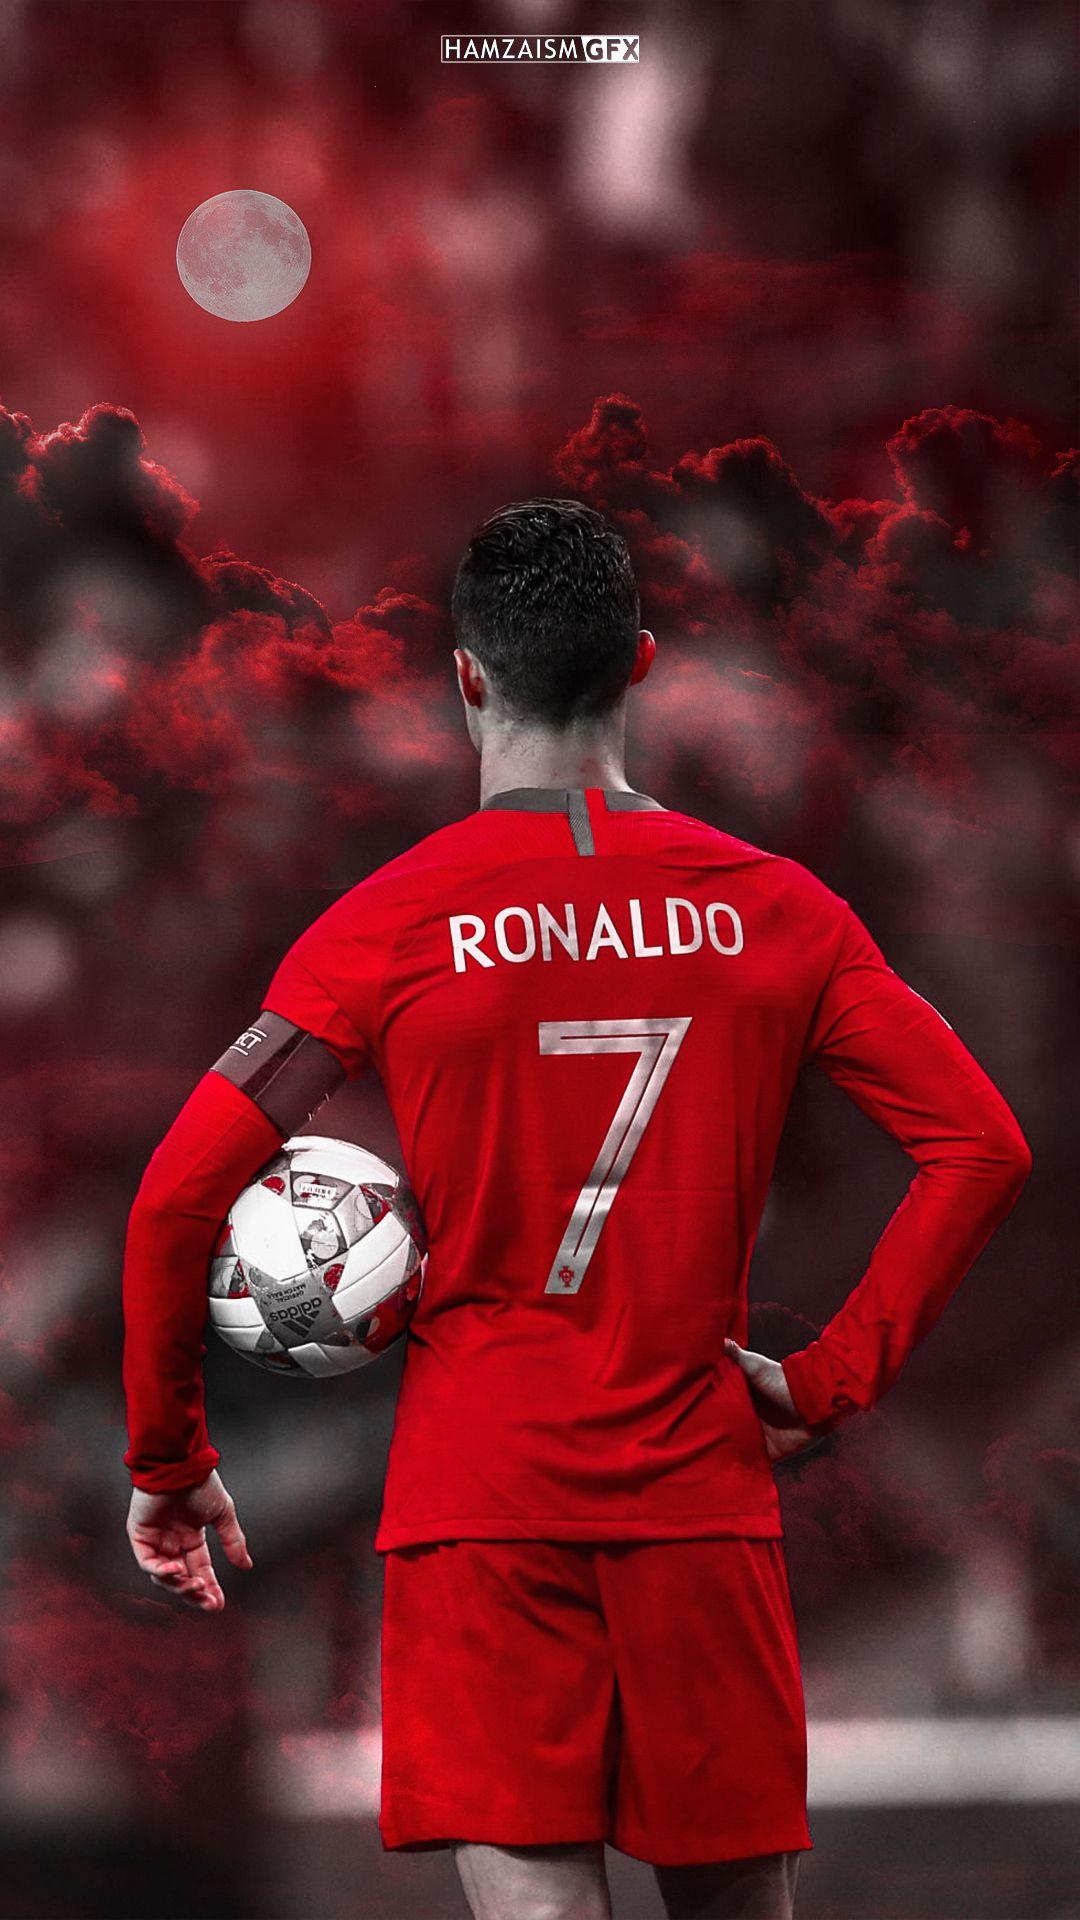 Cristiano Ronaldo Cristiano Ronaldo Wallpapers Ronaldo Wallpapers Ronaldo